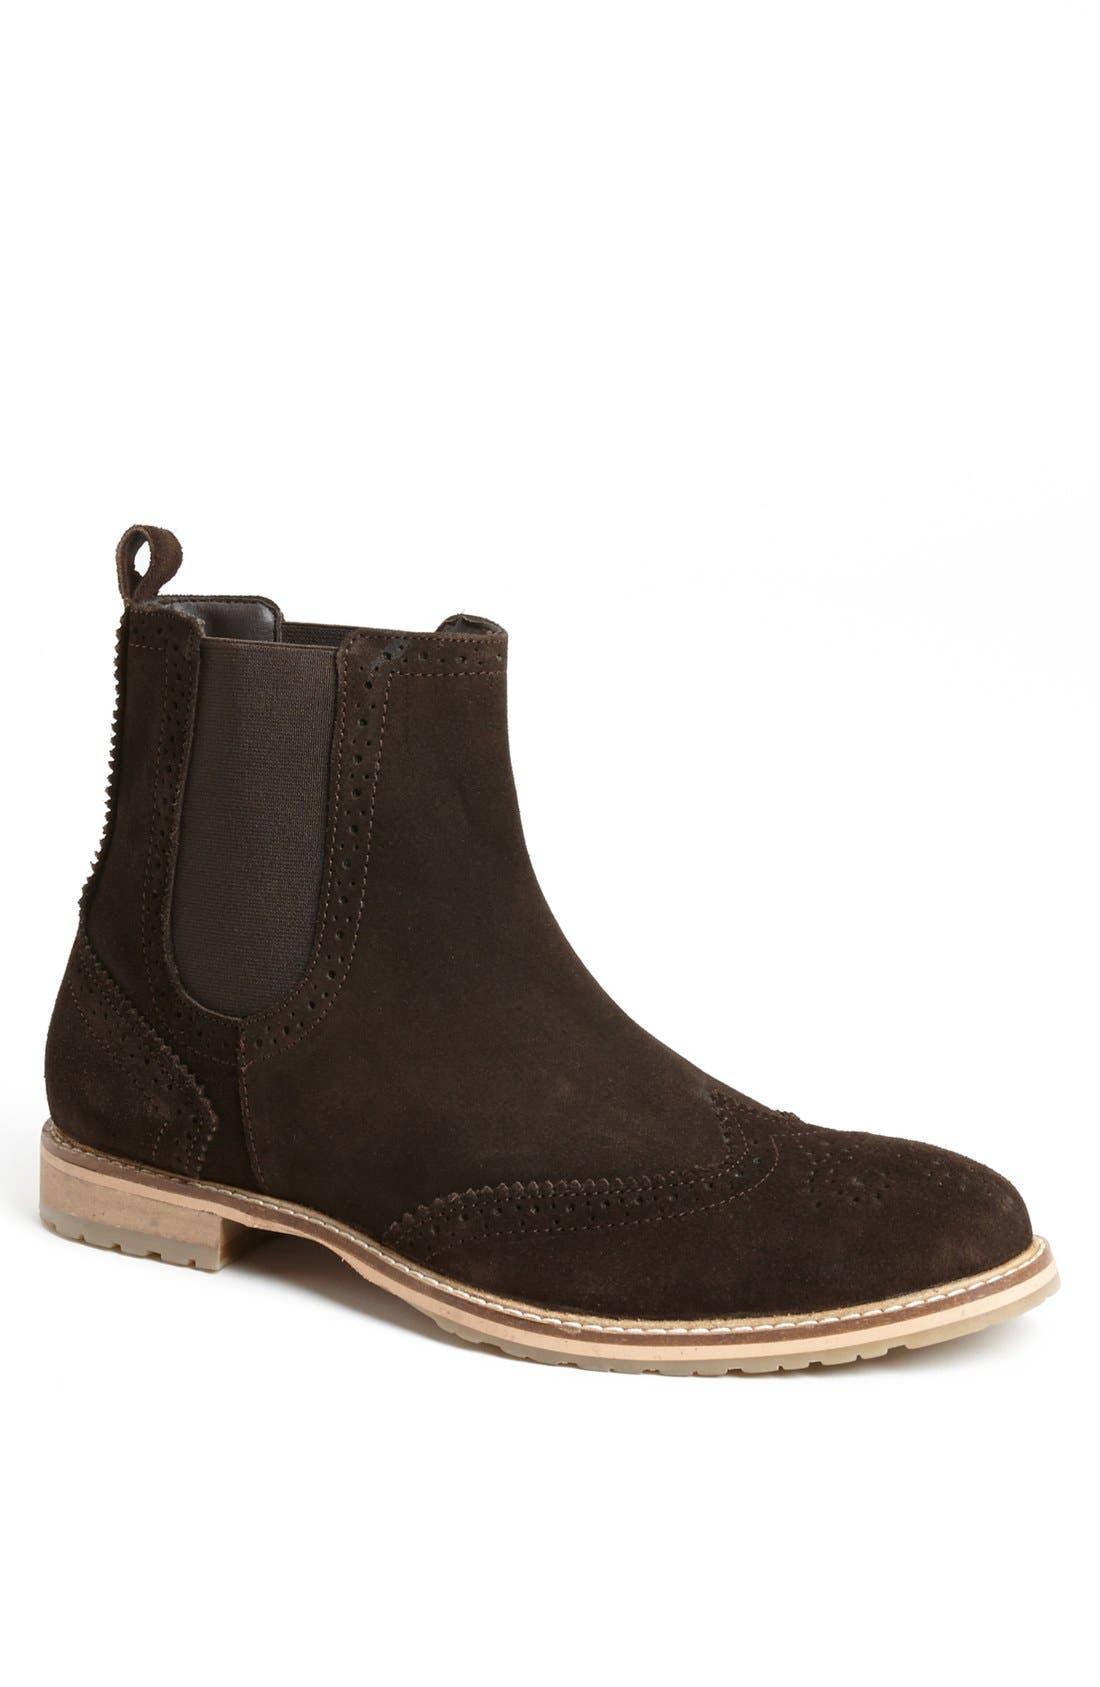 Alternate Image 1 Selected - Ben Sherman 'Bruno' Wingtip Chelsea Boot (Men)